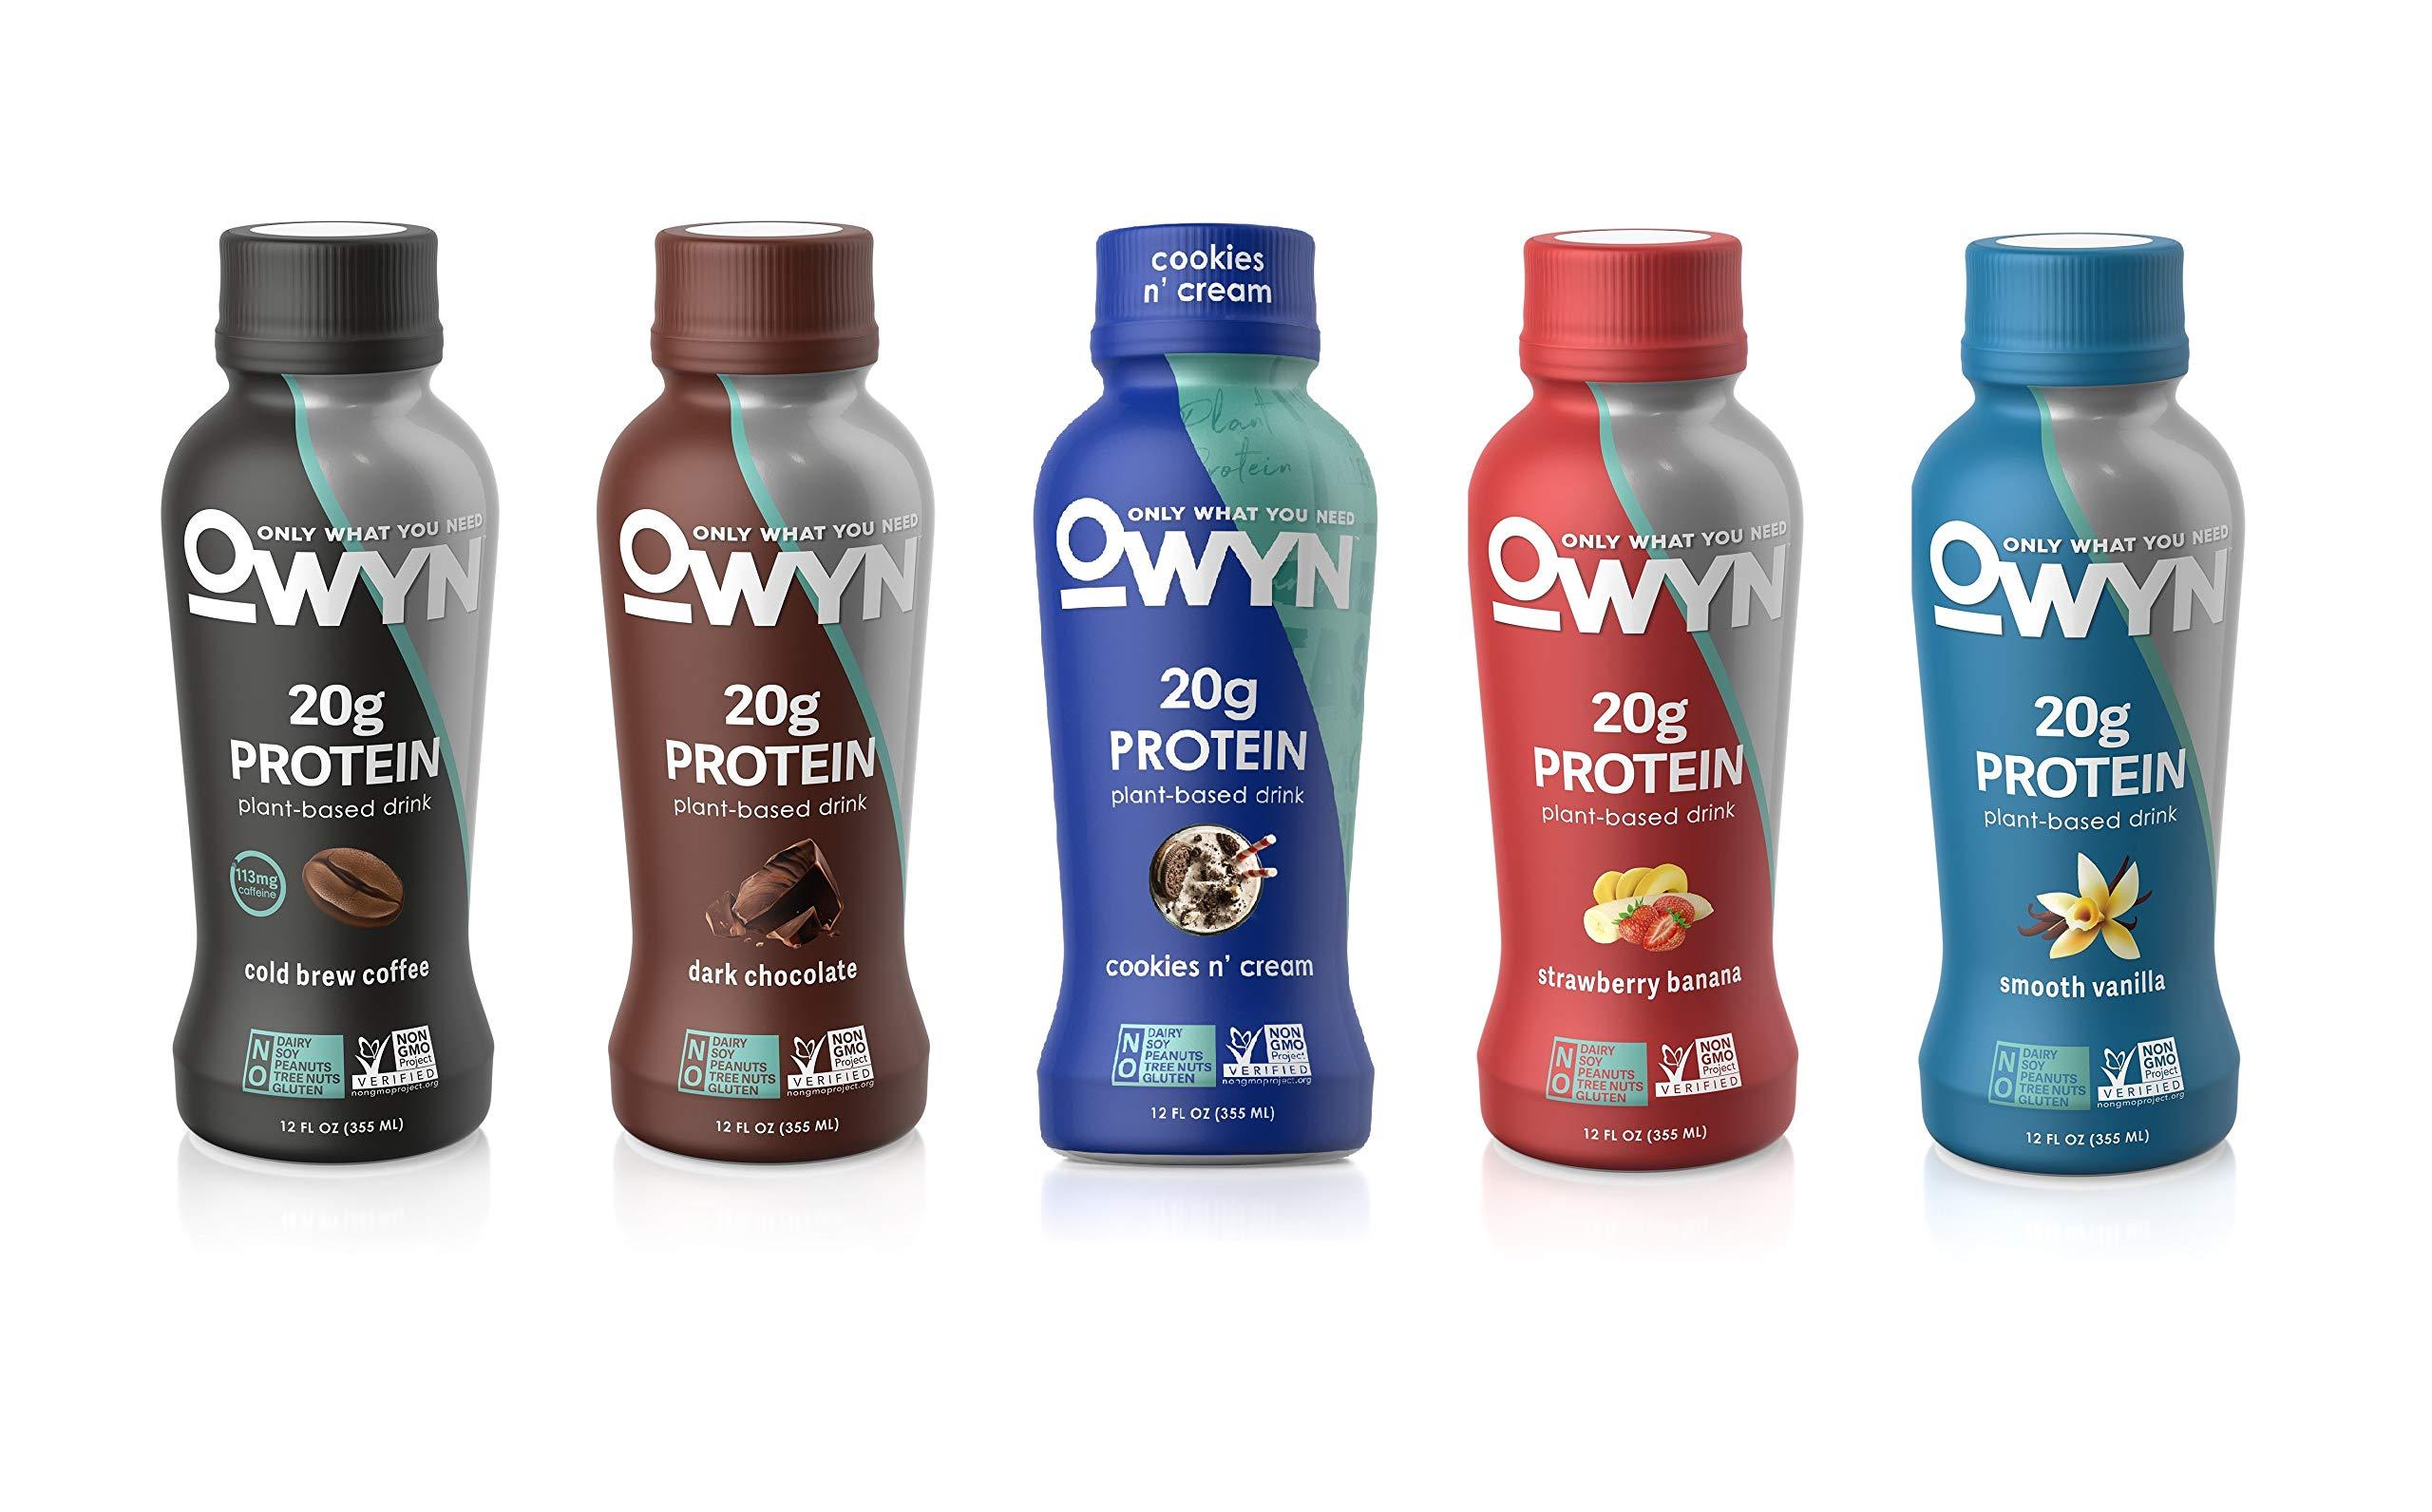 OWYN, Vegan Protein Shake, 5 Flavor Variety Pack ,12 Fl Oz, 100-Percent Plant-Based, Dairy-Free, Gluten-Free, Soy-Free, Tree Nut-Free, Egg-Free, Allergy-Free, Vegetarian, Kosher (Pack of 5) by Oasis Snacks